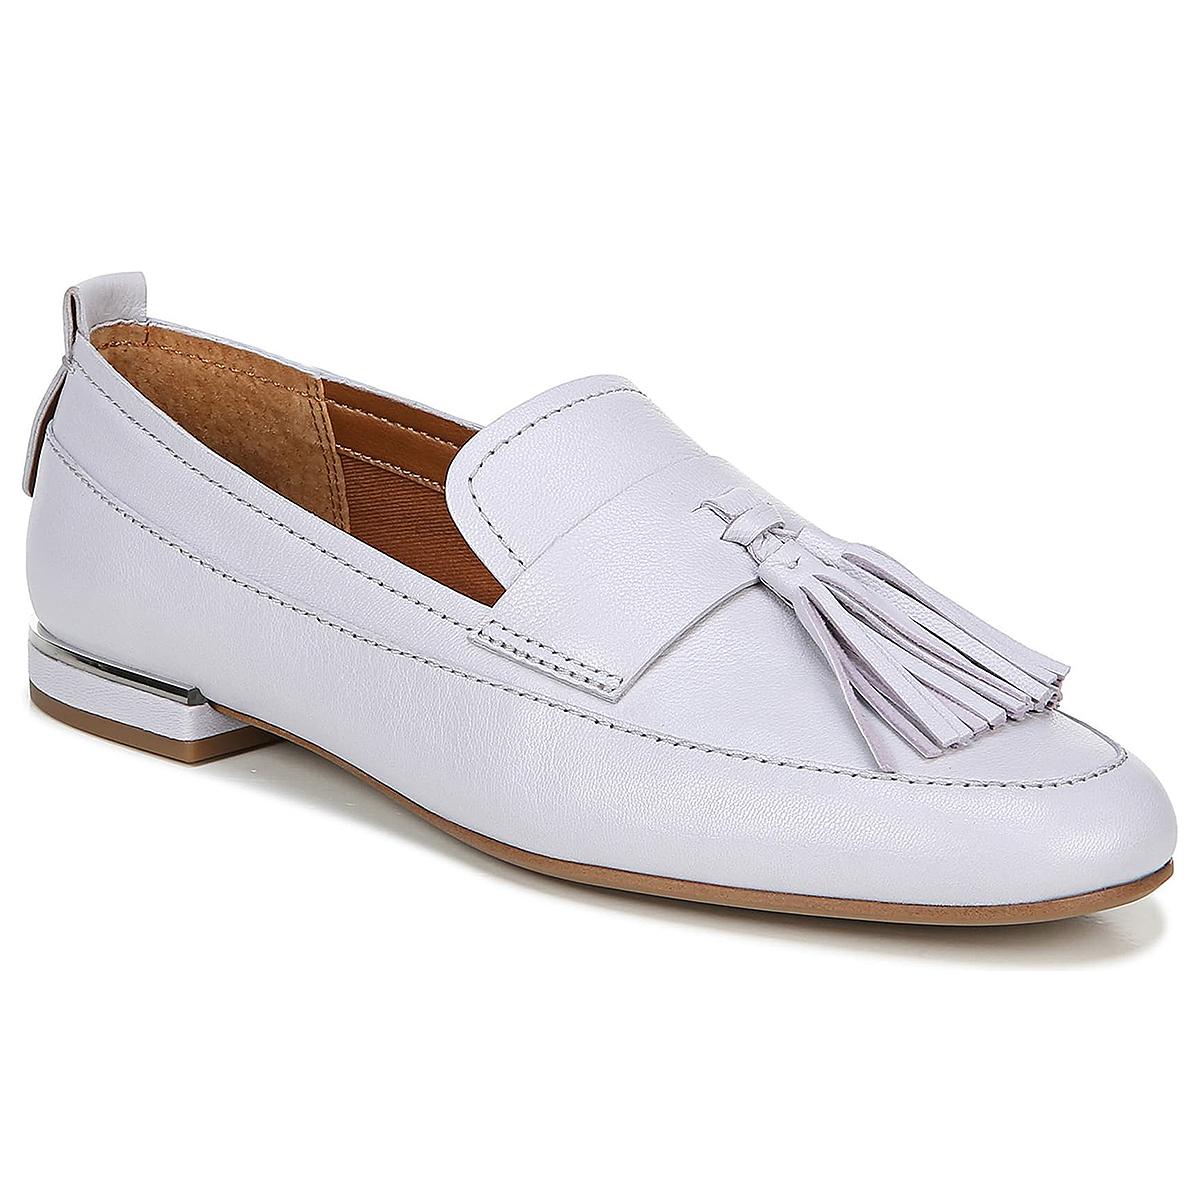 franco-sarto-bisma-loafer